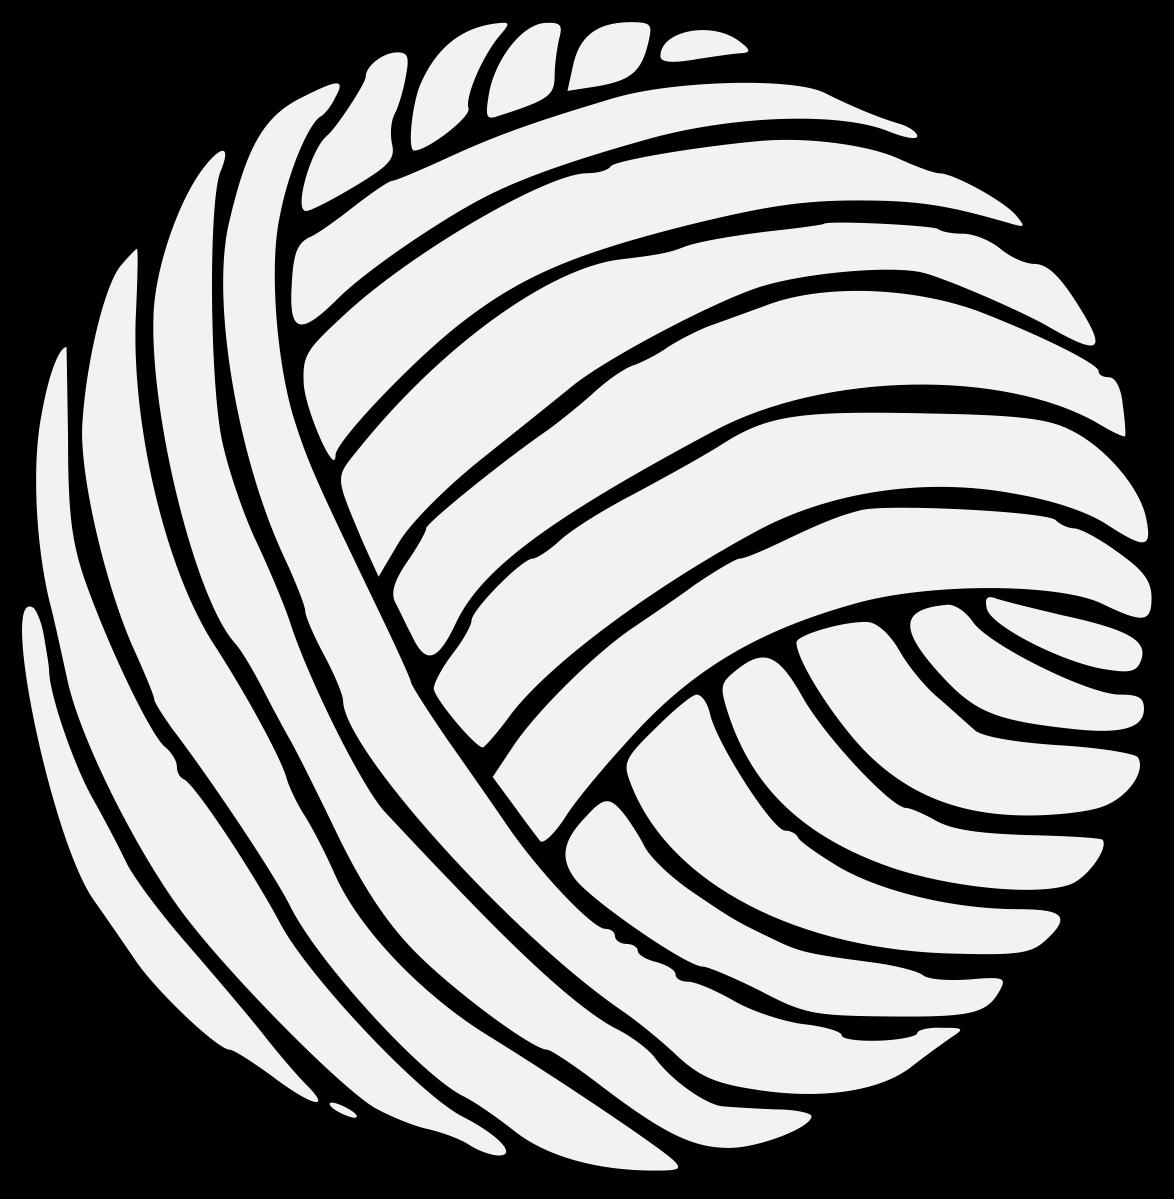 1174x1199 yarn drawing ball yarn for free download